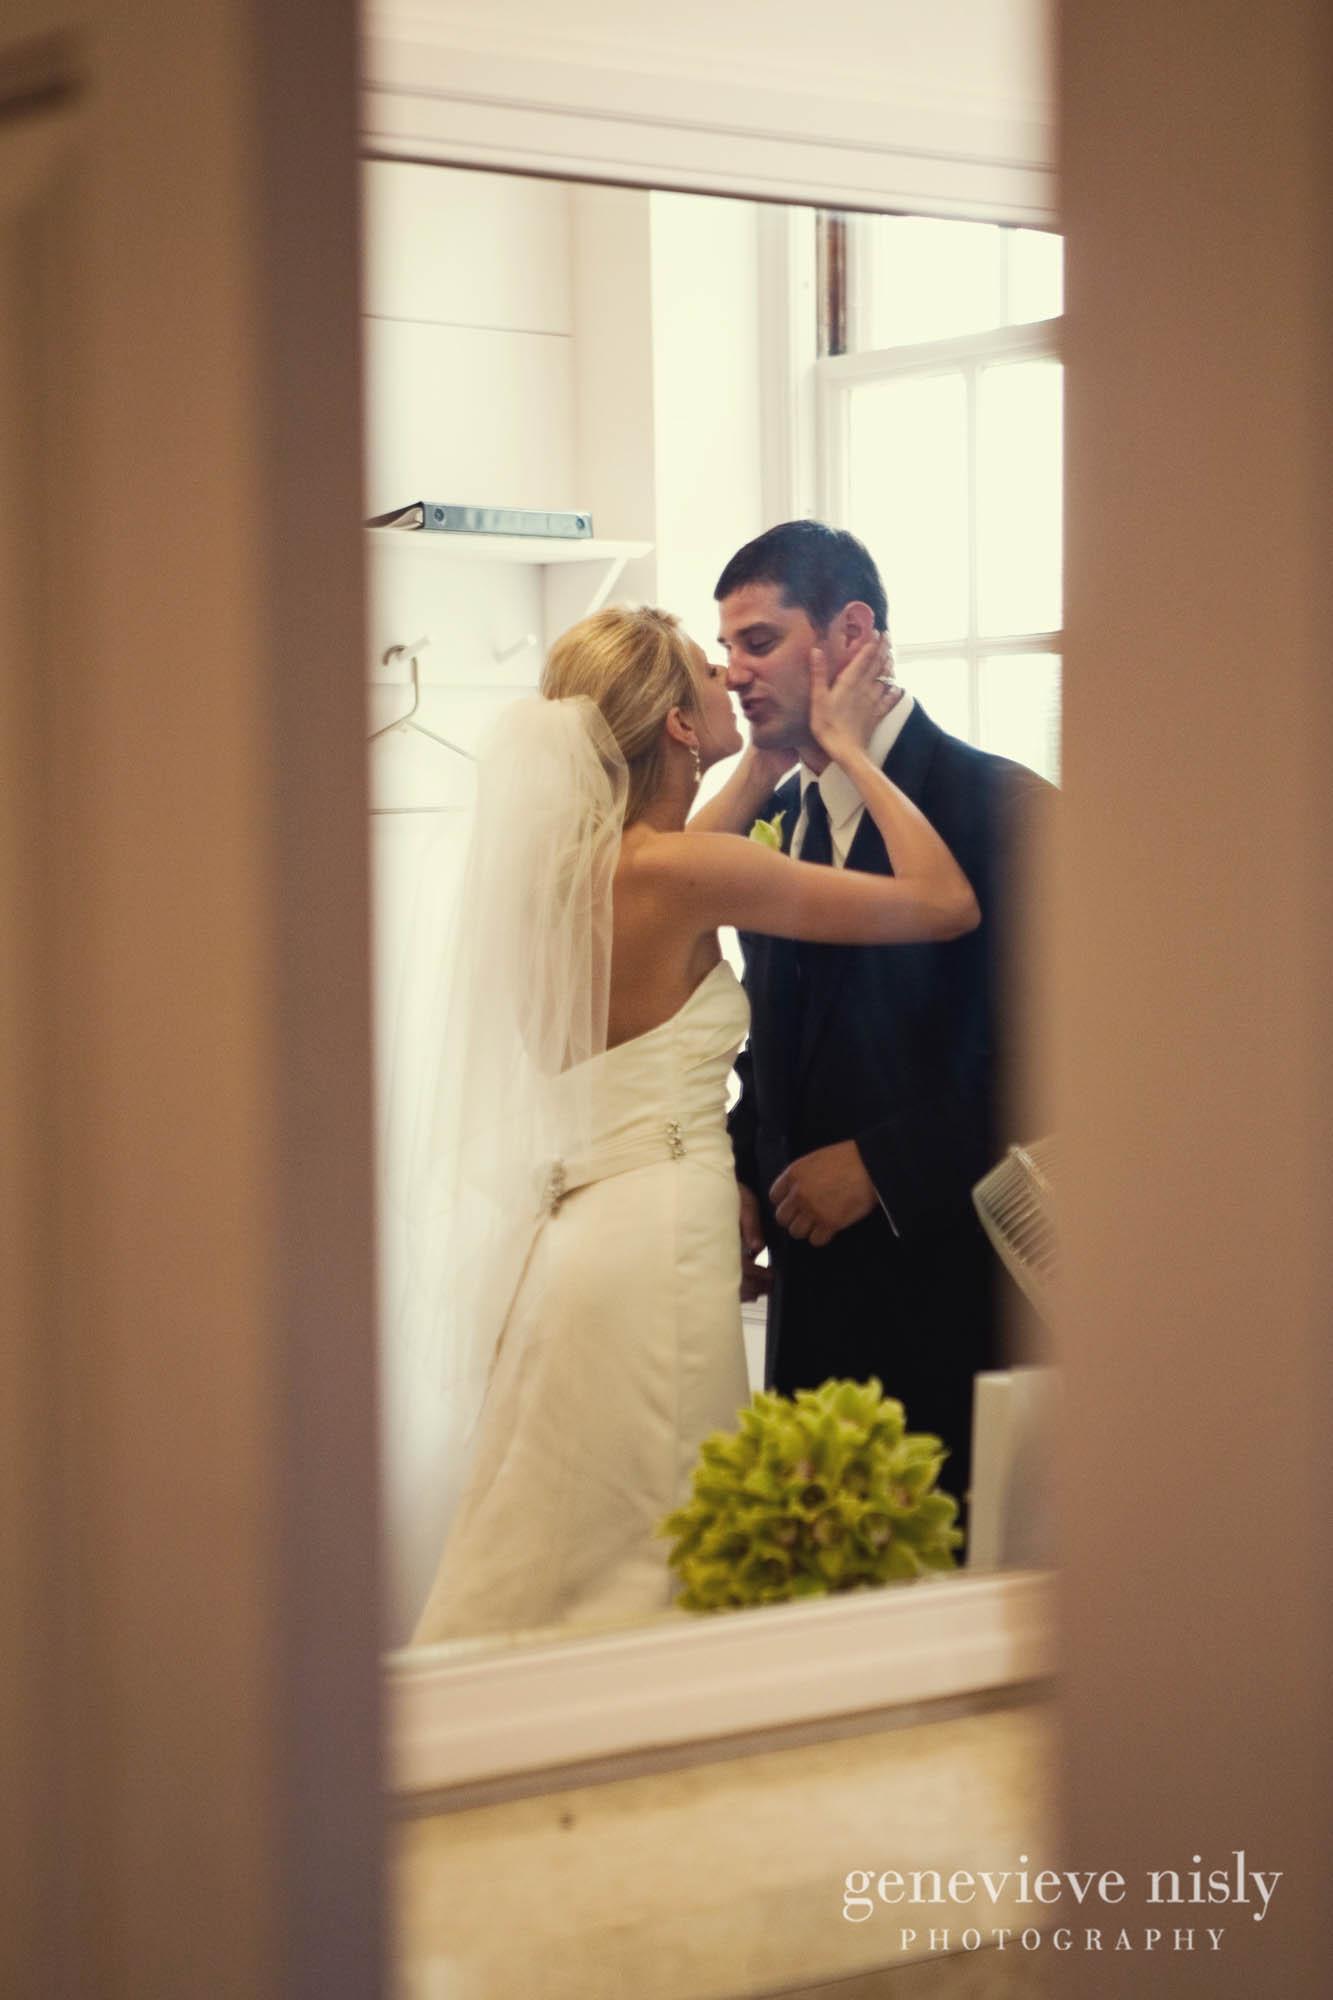 Reet and karan wedding